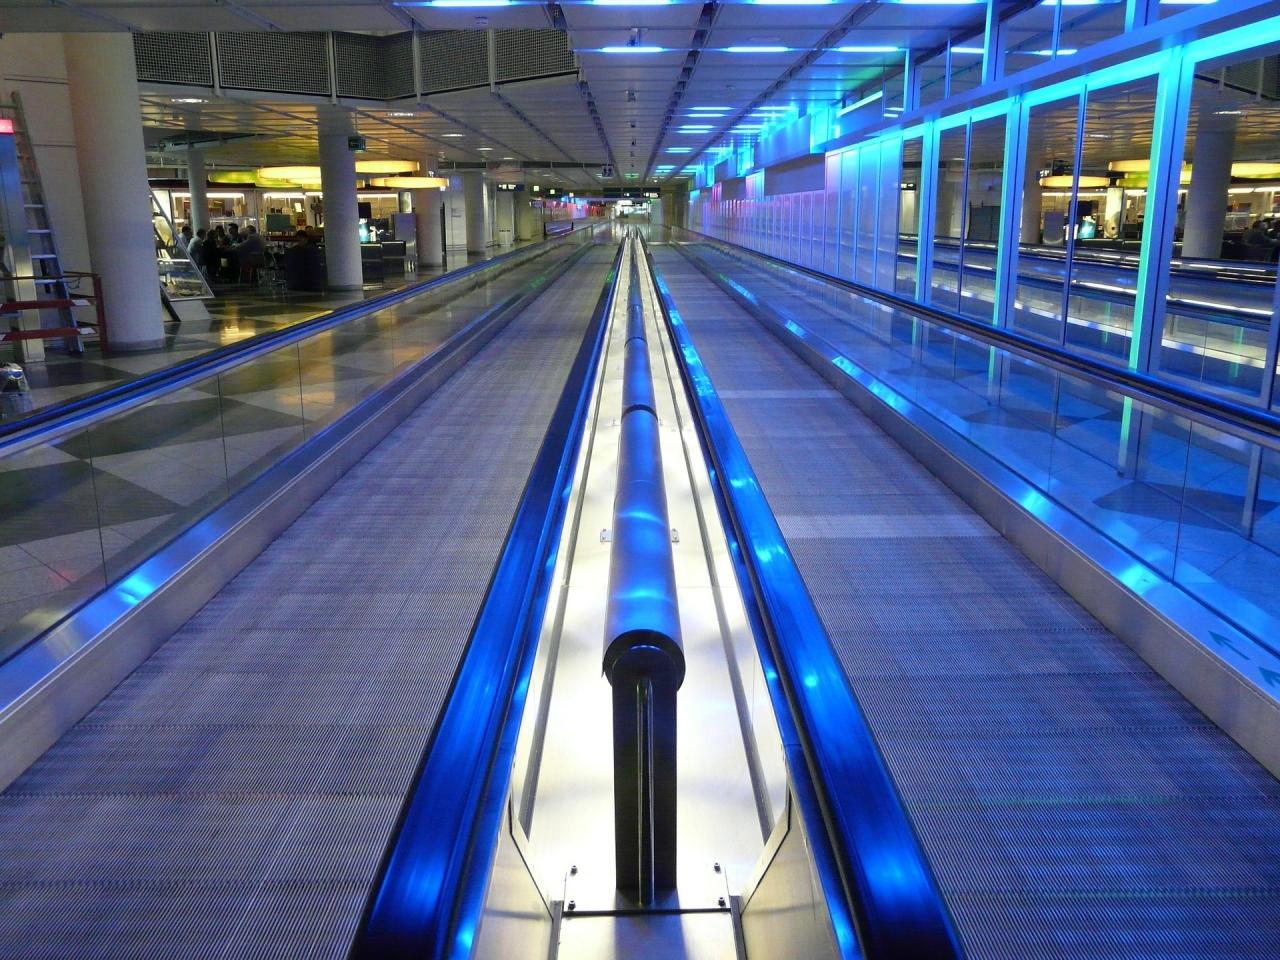 Moving Walkway Roller Platform (Hans/Pixabay)